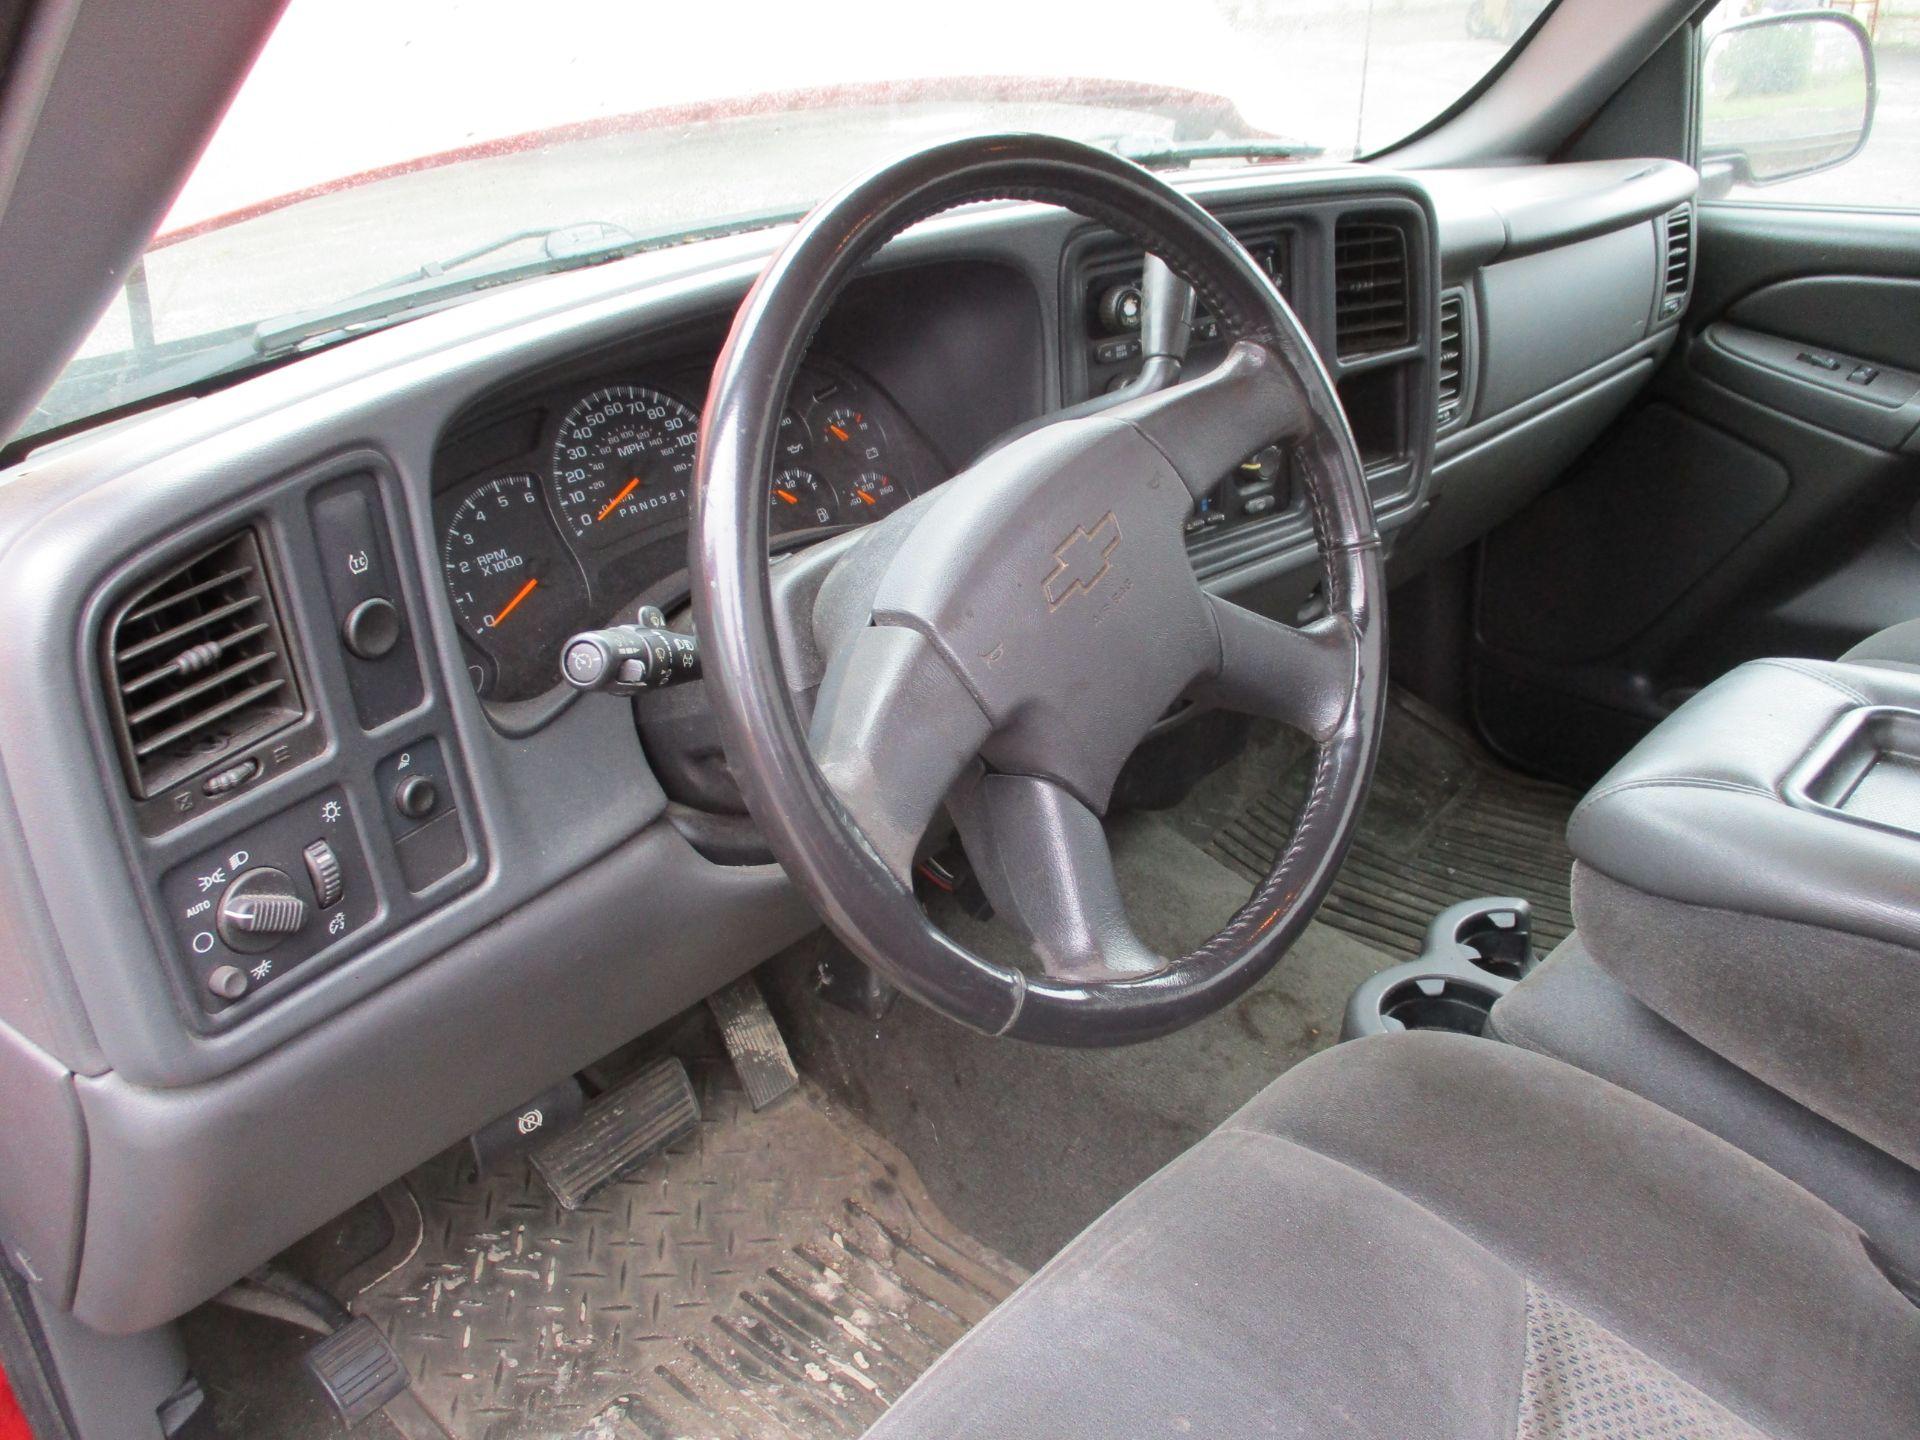 2006 Chevrolet Silverado 1500 LT Pickup, VIN 1GCEC14V96E251510, Regular Cab, Automatic, AC, 8' - Image 12 of 21